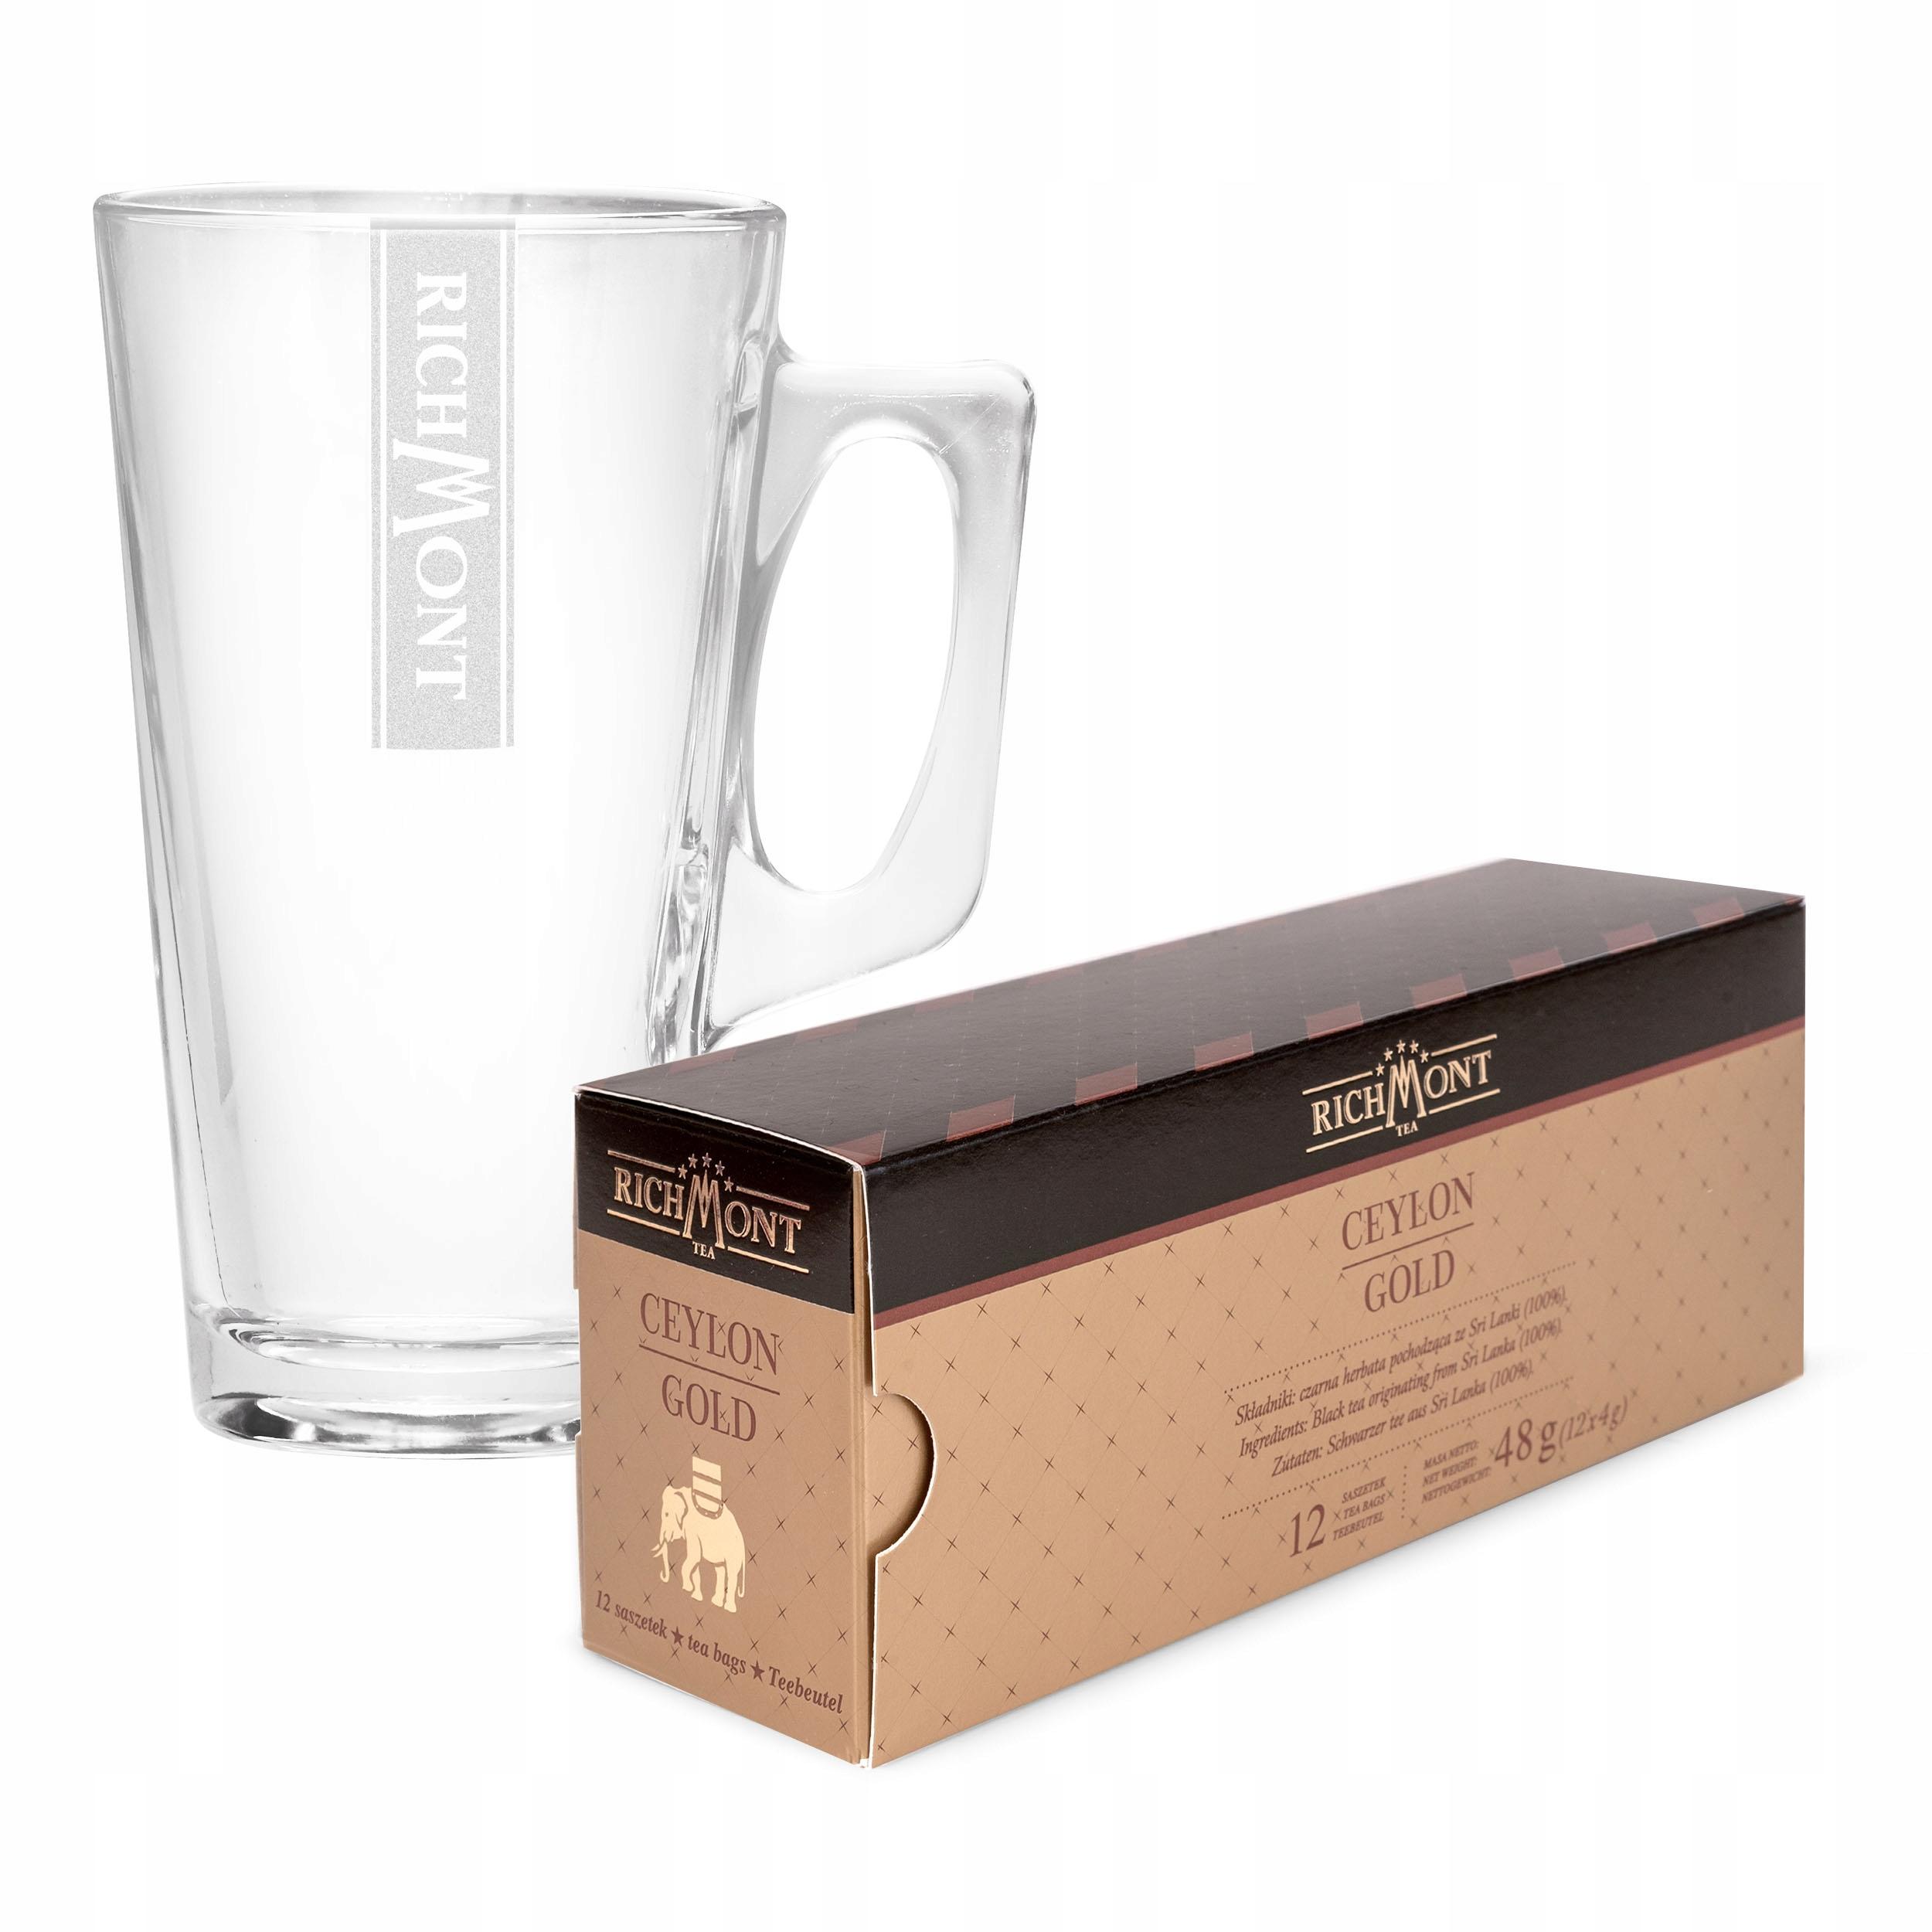 Чай Richmont Ceylon Gold 12 + ГОРЯЧИЙ стакан